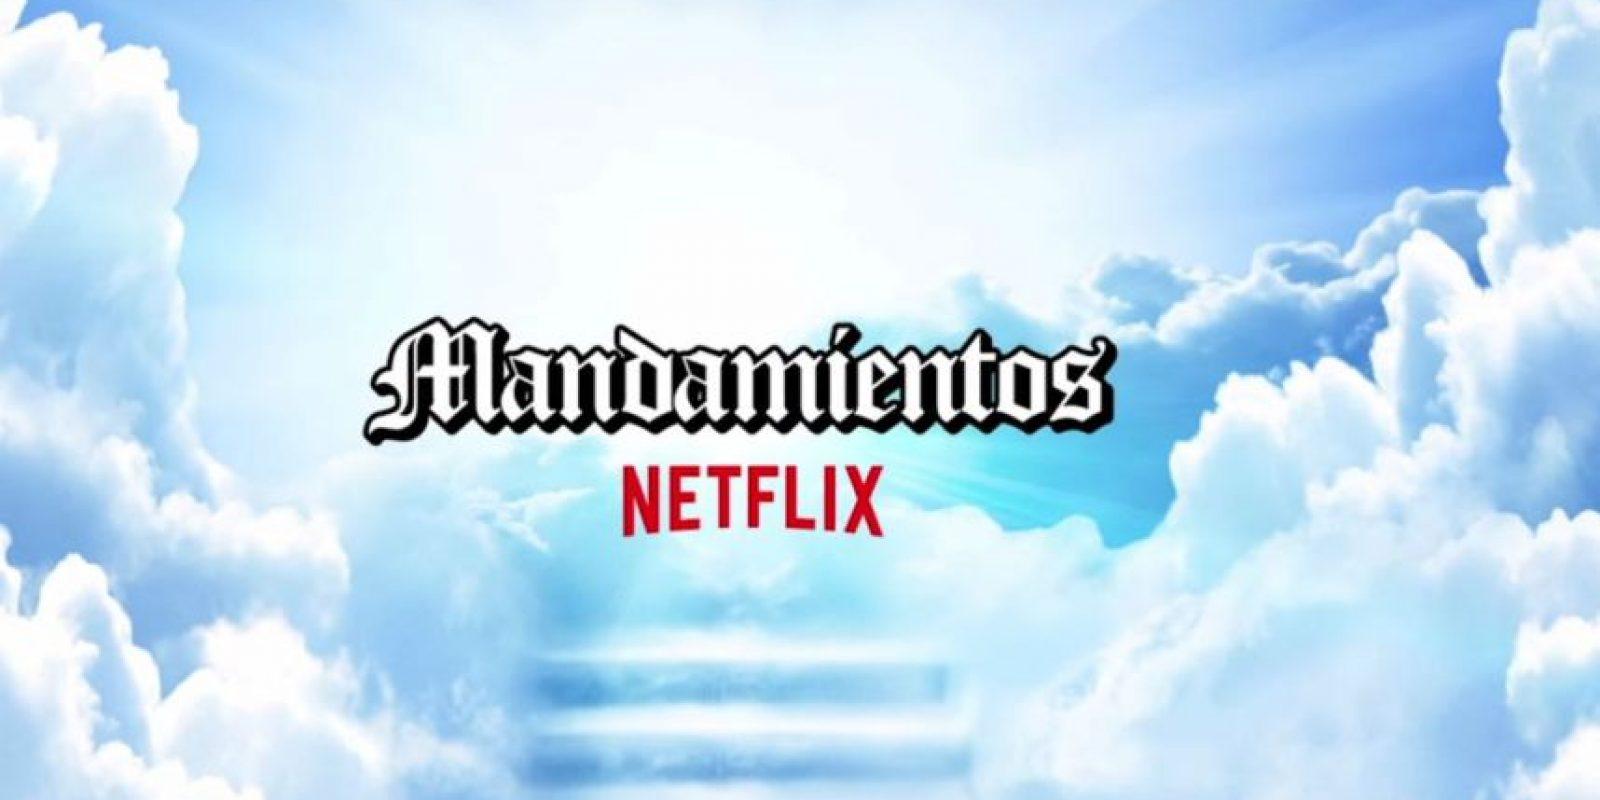 Netflix tiene sus propios 10 mandamientos. Foto:Netflix